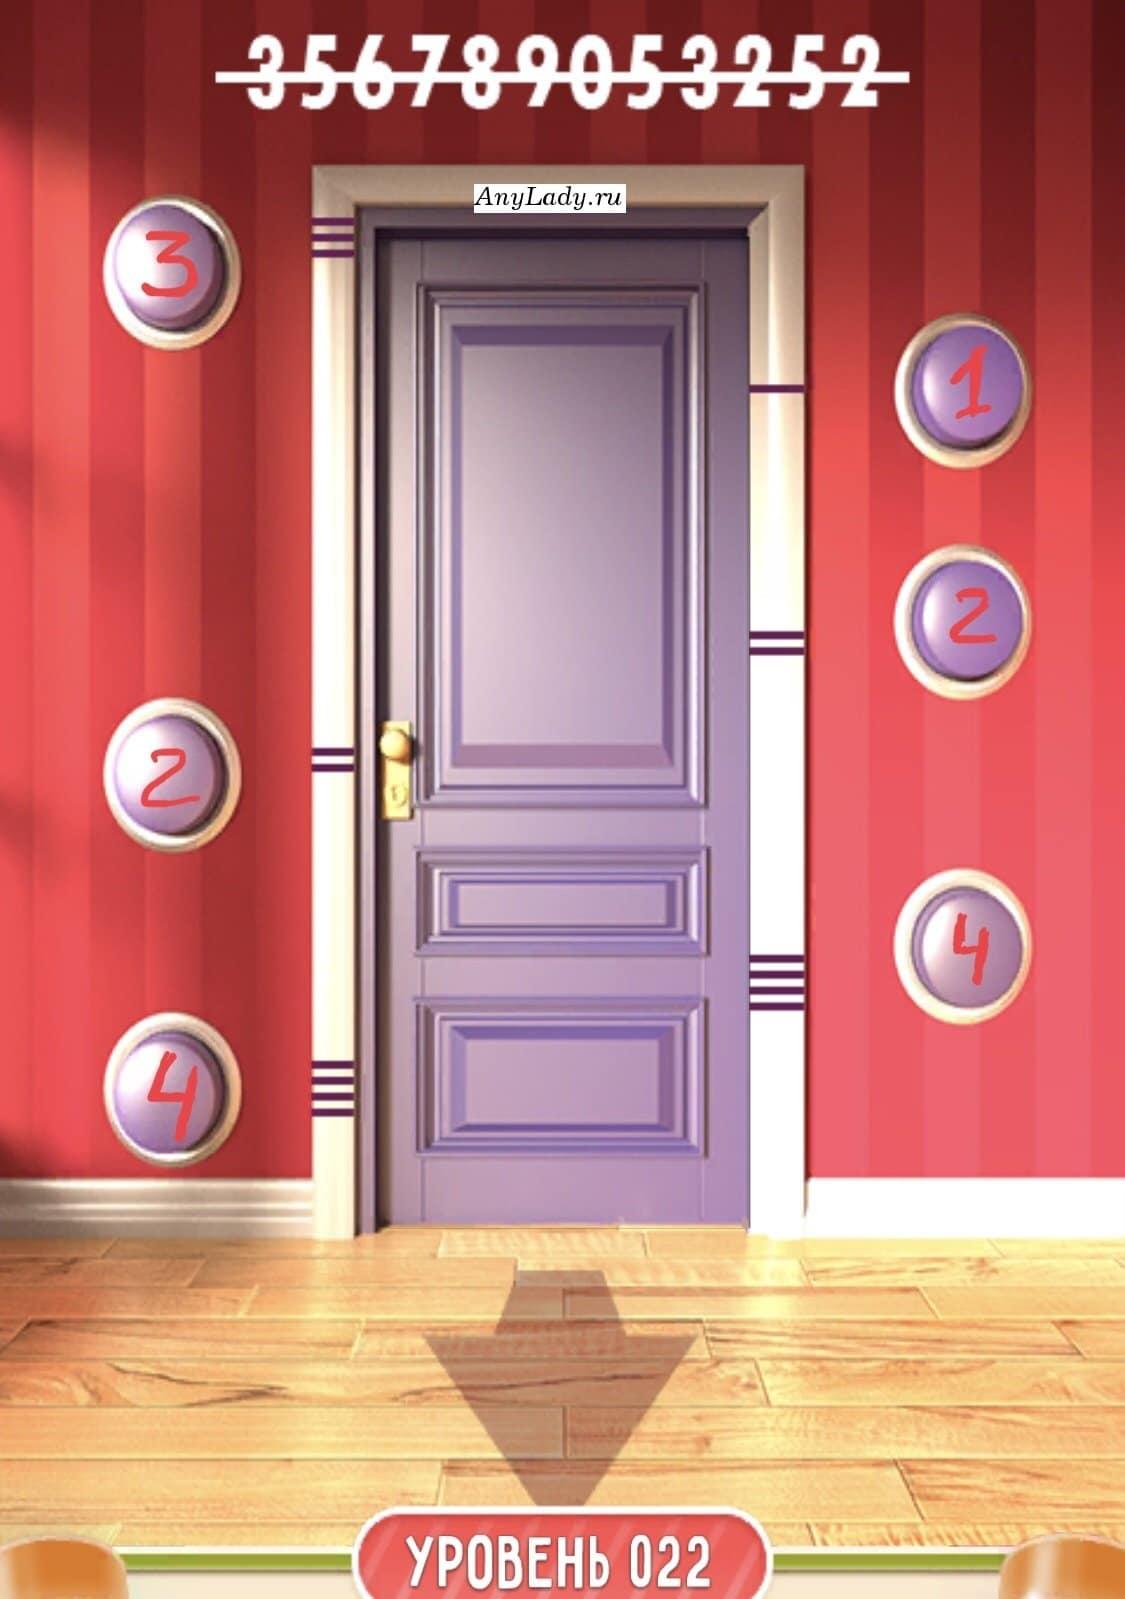 Кликните на кнопки: первая слева - 3 раза; верхняя справа - 1 раз , справа по середине - 2 раза; слева в середине -2 раза; справа нижняя - 4 раза и слева нижняя 4 раза. Дверь открыта.